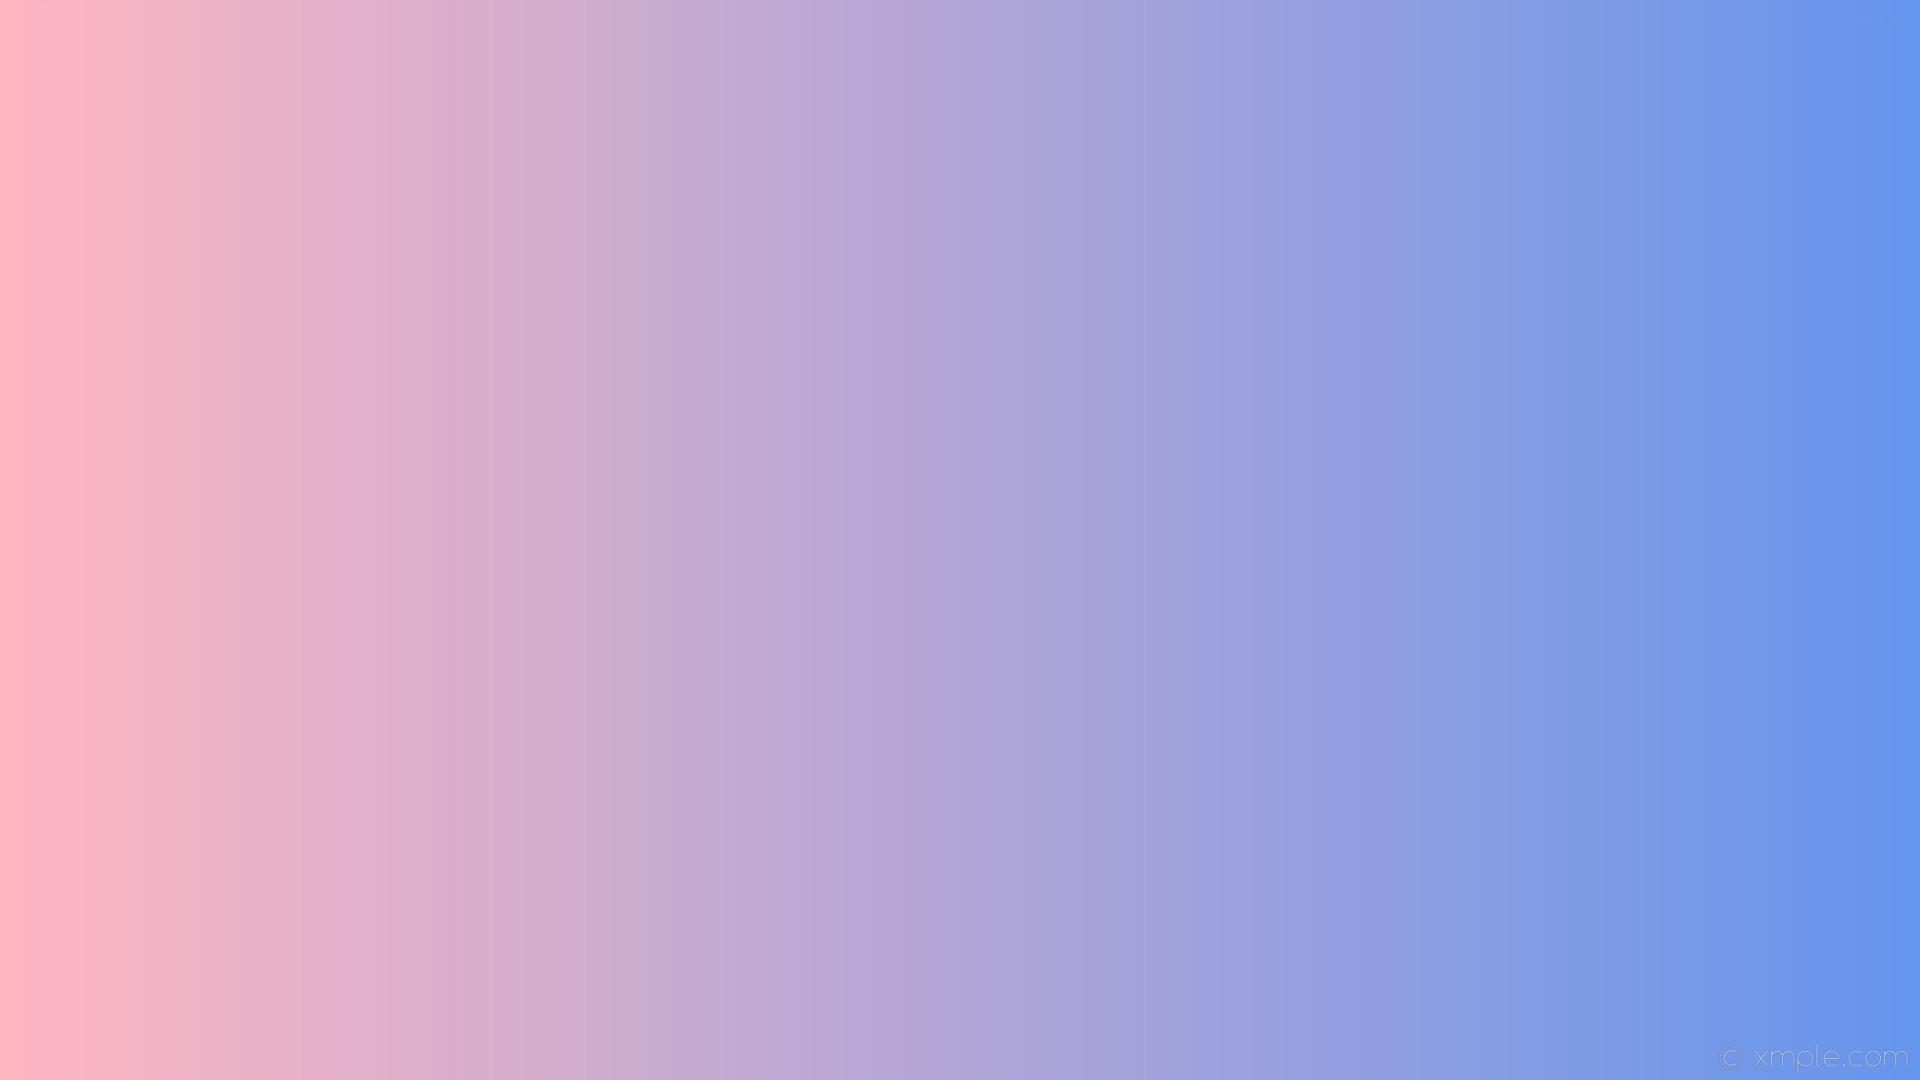 wallpaper blue pink linear gradient cornflower blue light pink #6495ed  #ffb6c1 0°